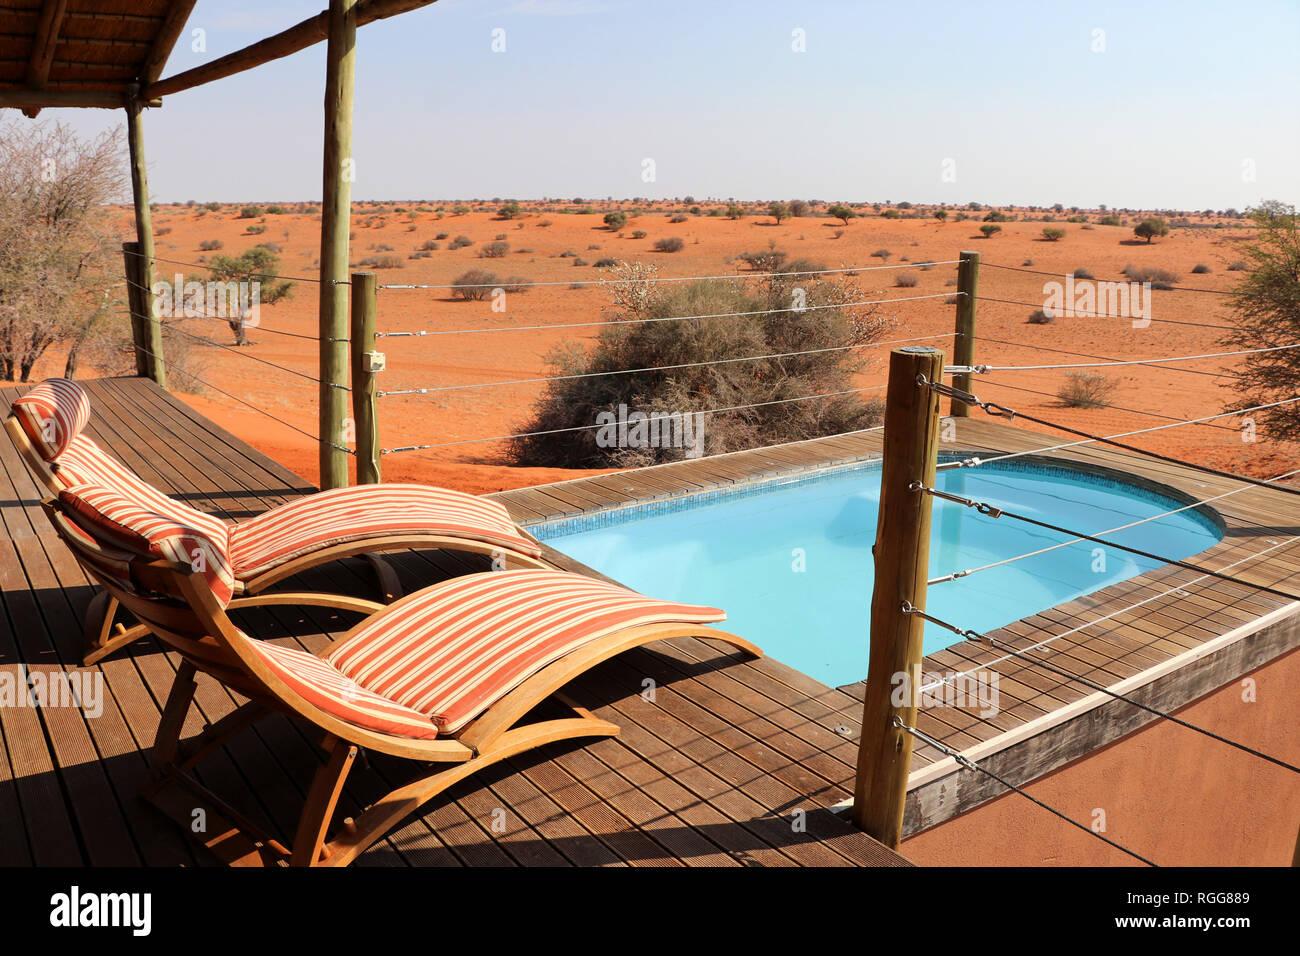 swimming pool with beautiful view in the Kalahari desert – Namibia Africa - Stock Image